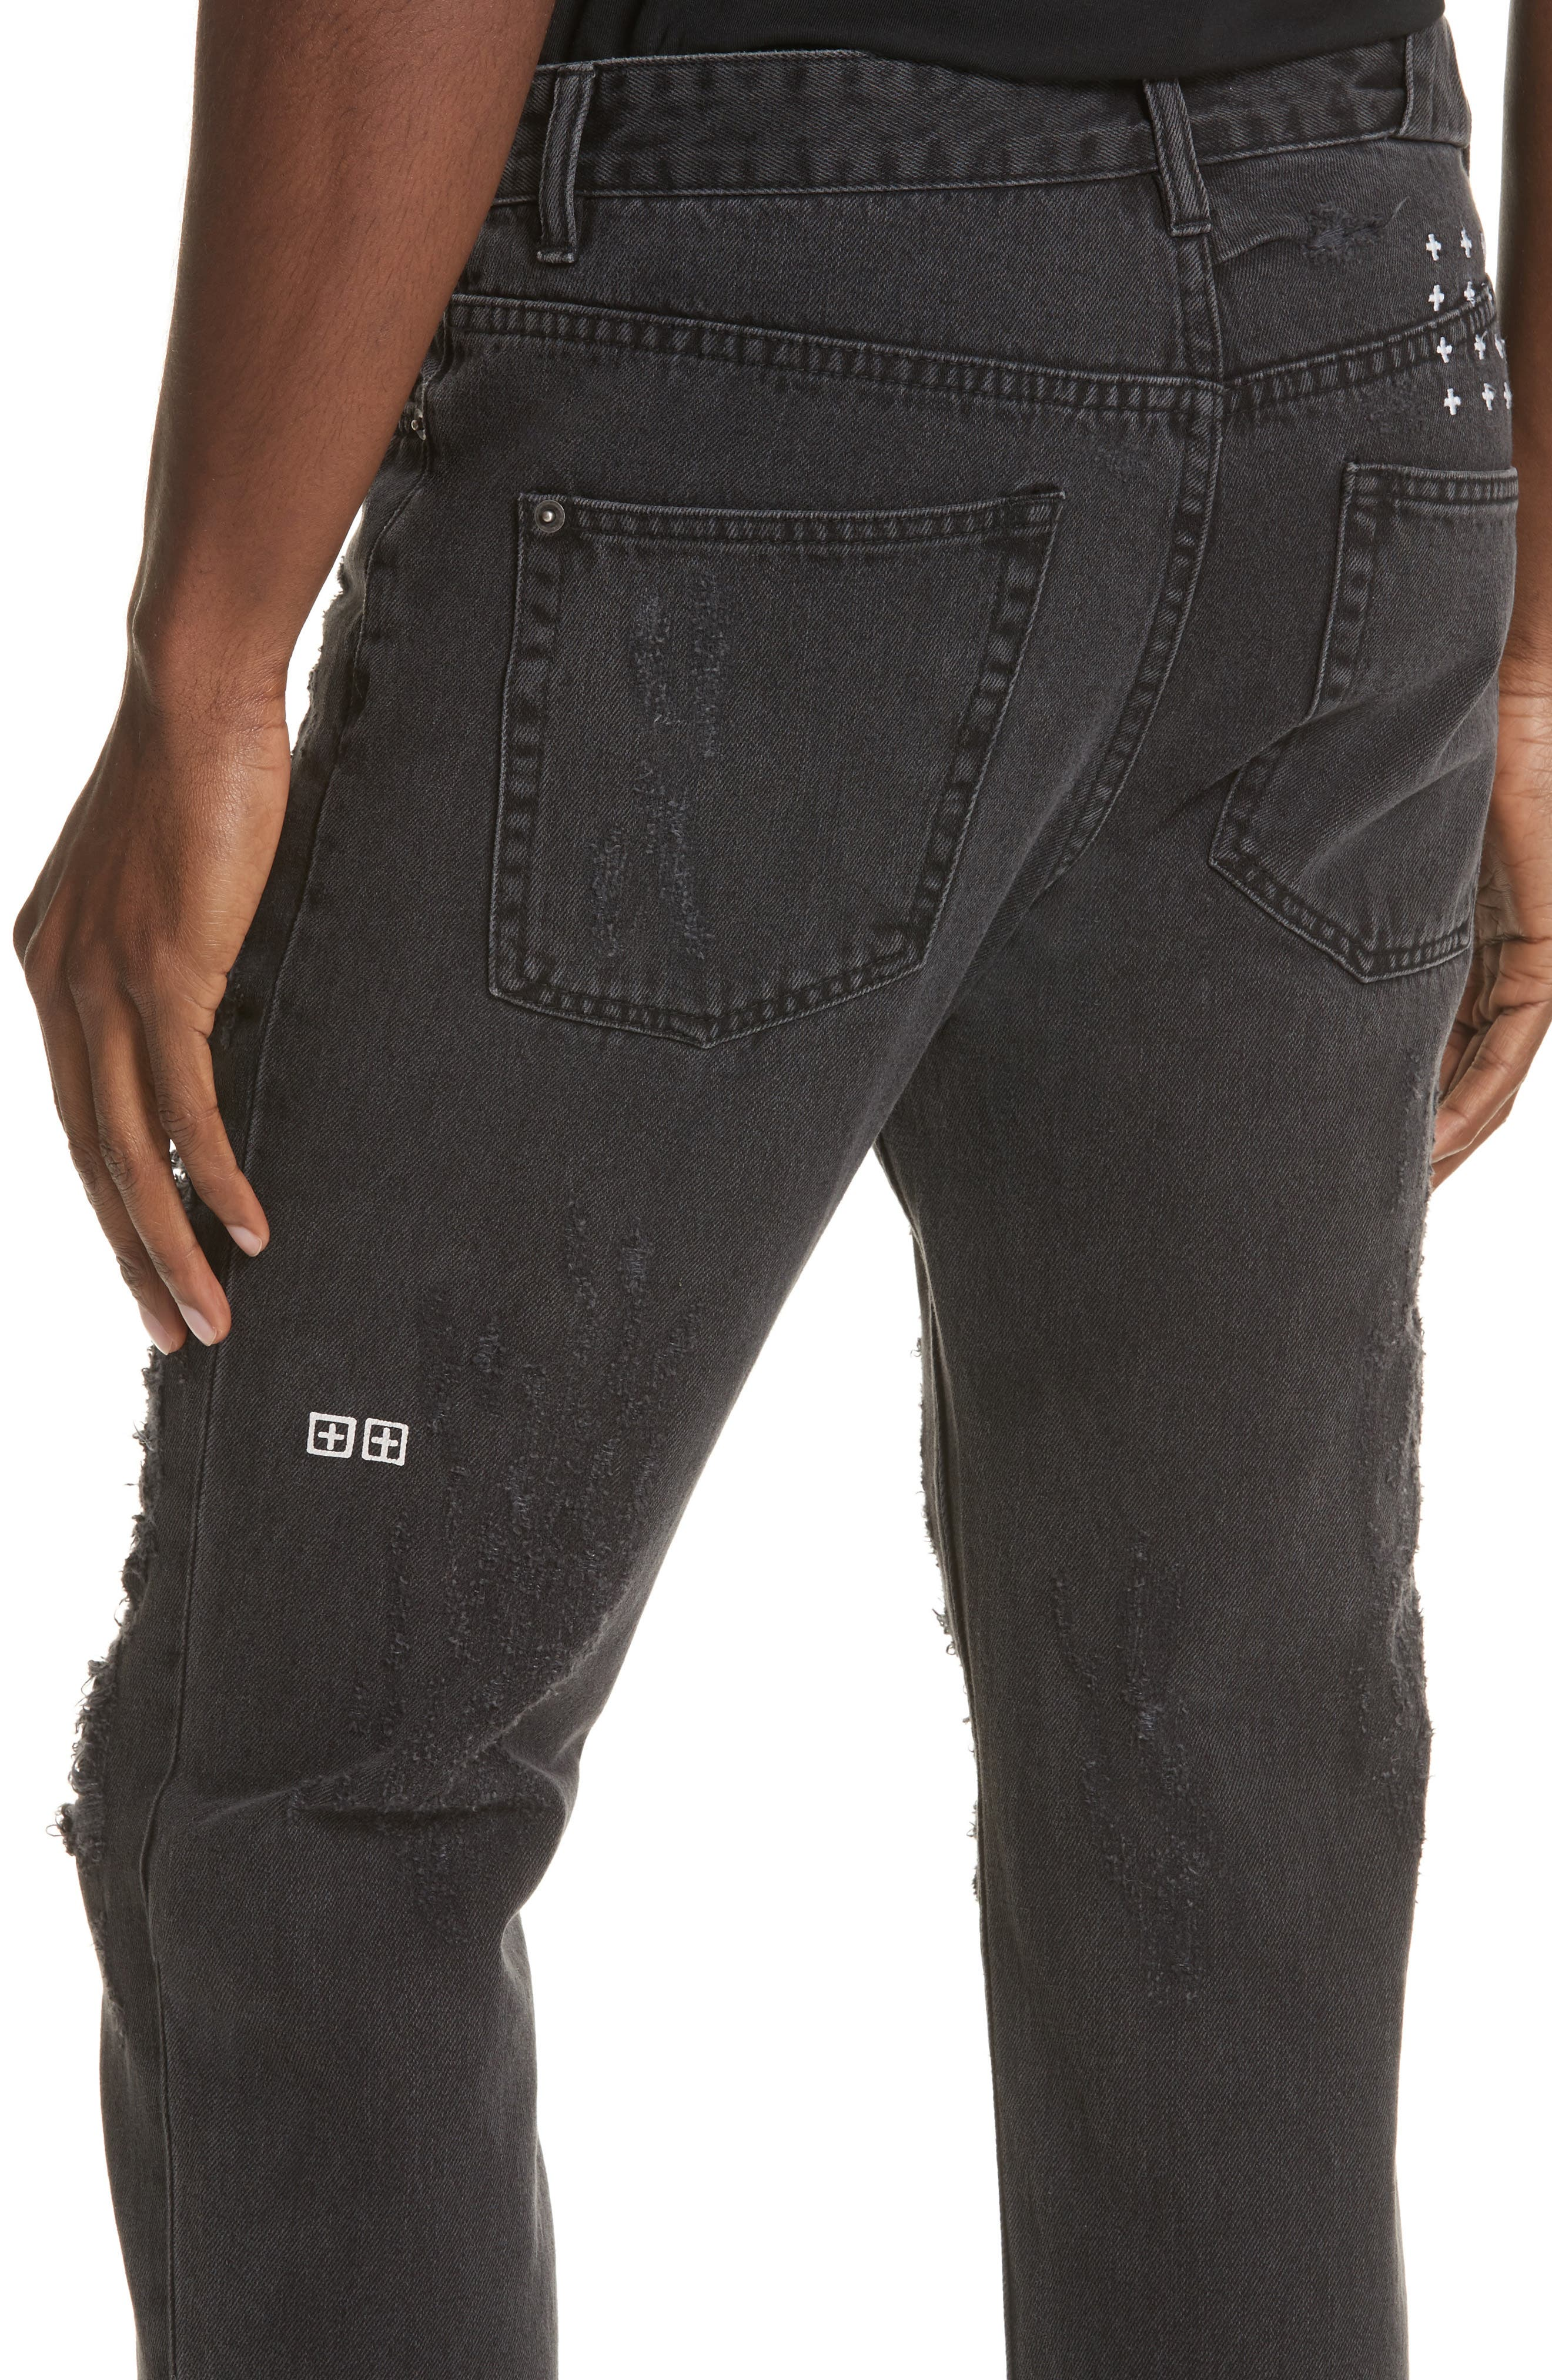 Chitch Chop Rat Attack Jeans,                             Alternate thumbnail 4, color,                             Black